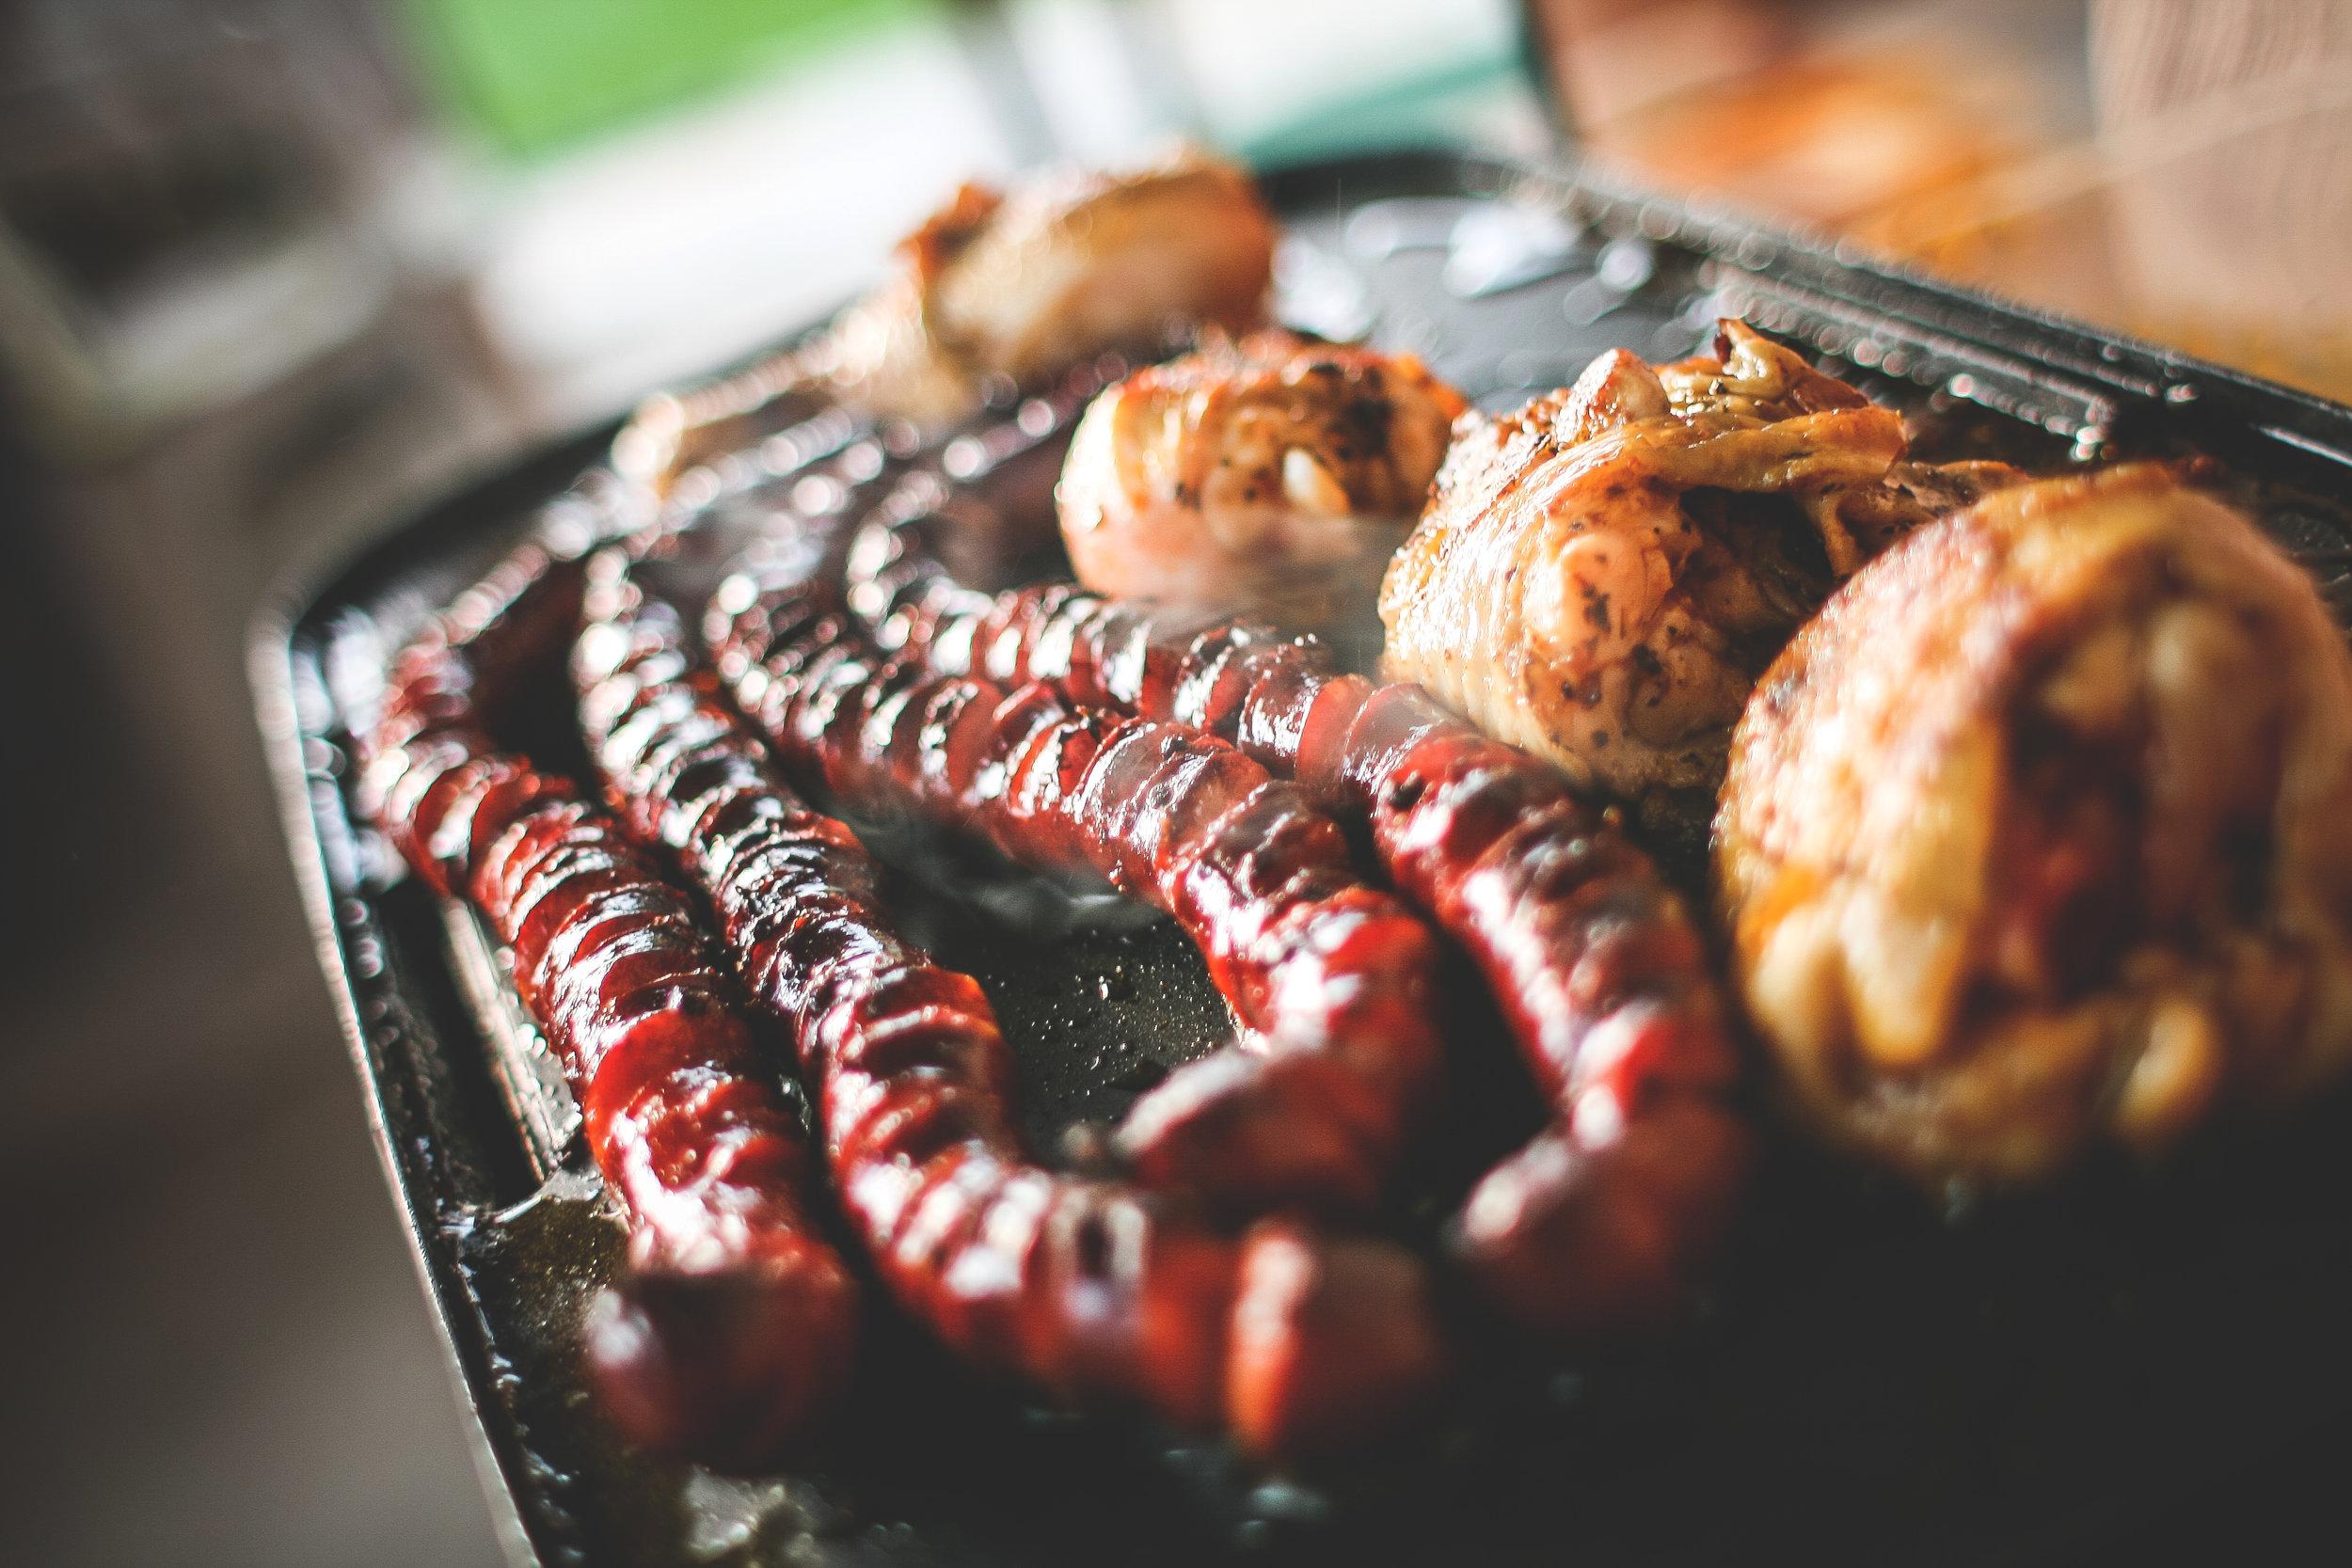 grill-bbq-party-picjumbo-com.jpg